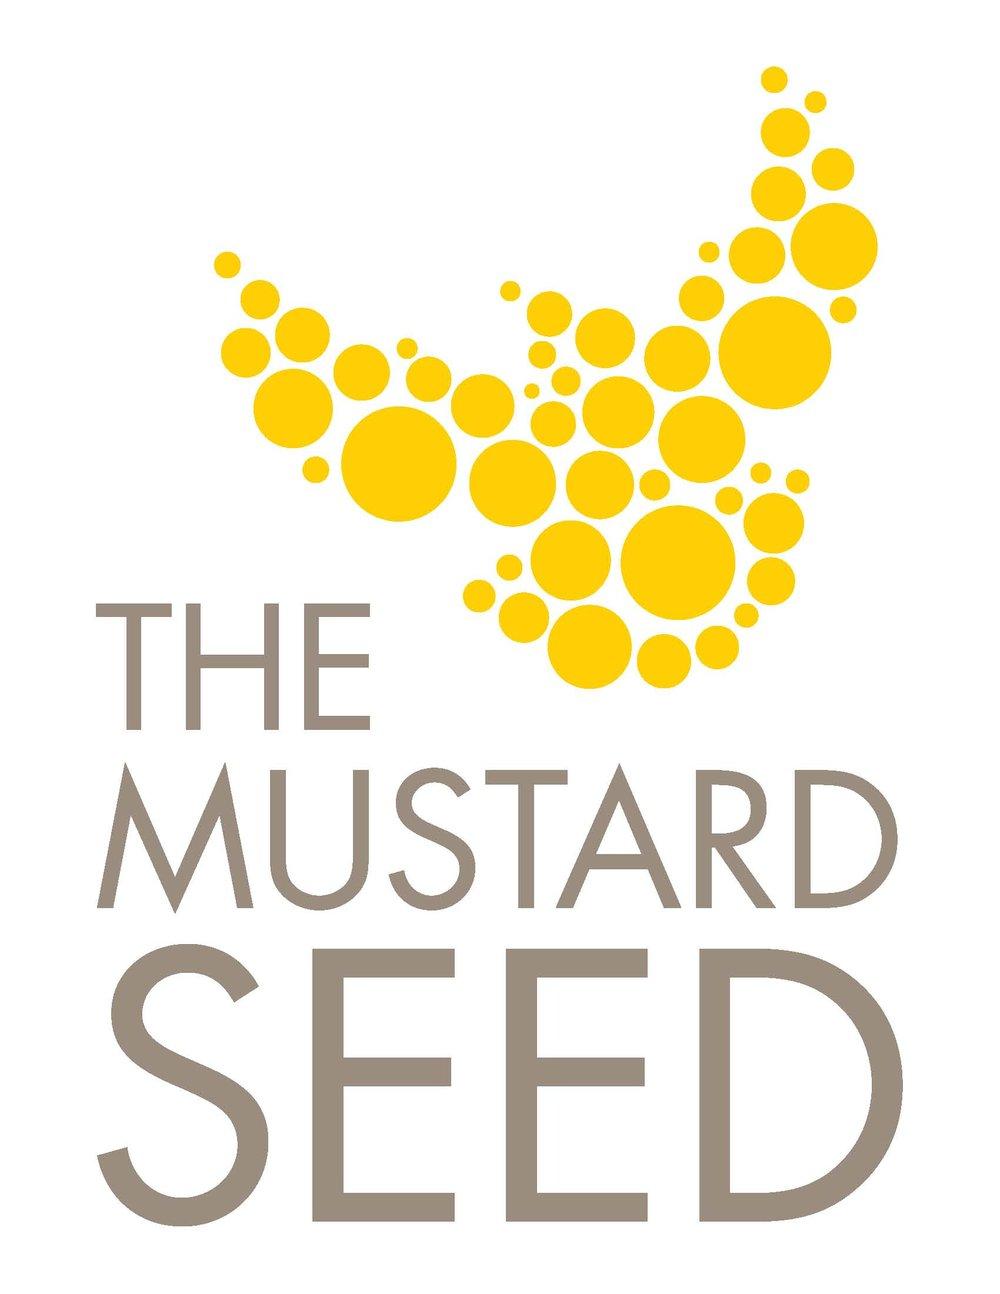 Mustard-Seed-Alberta.jpg